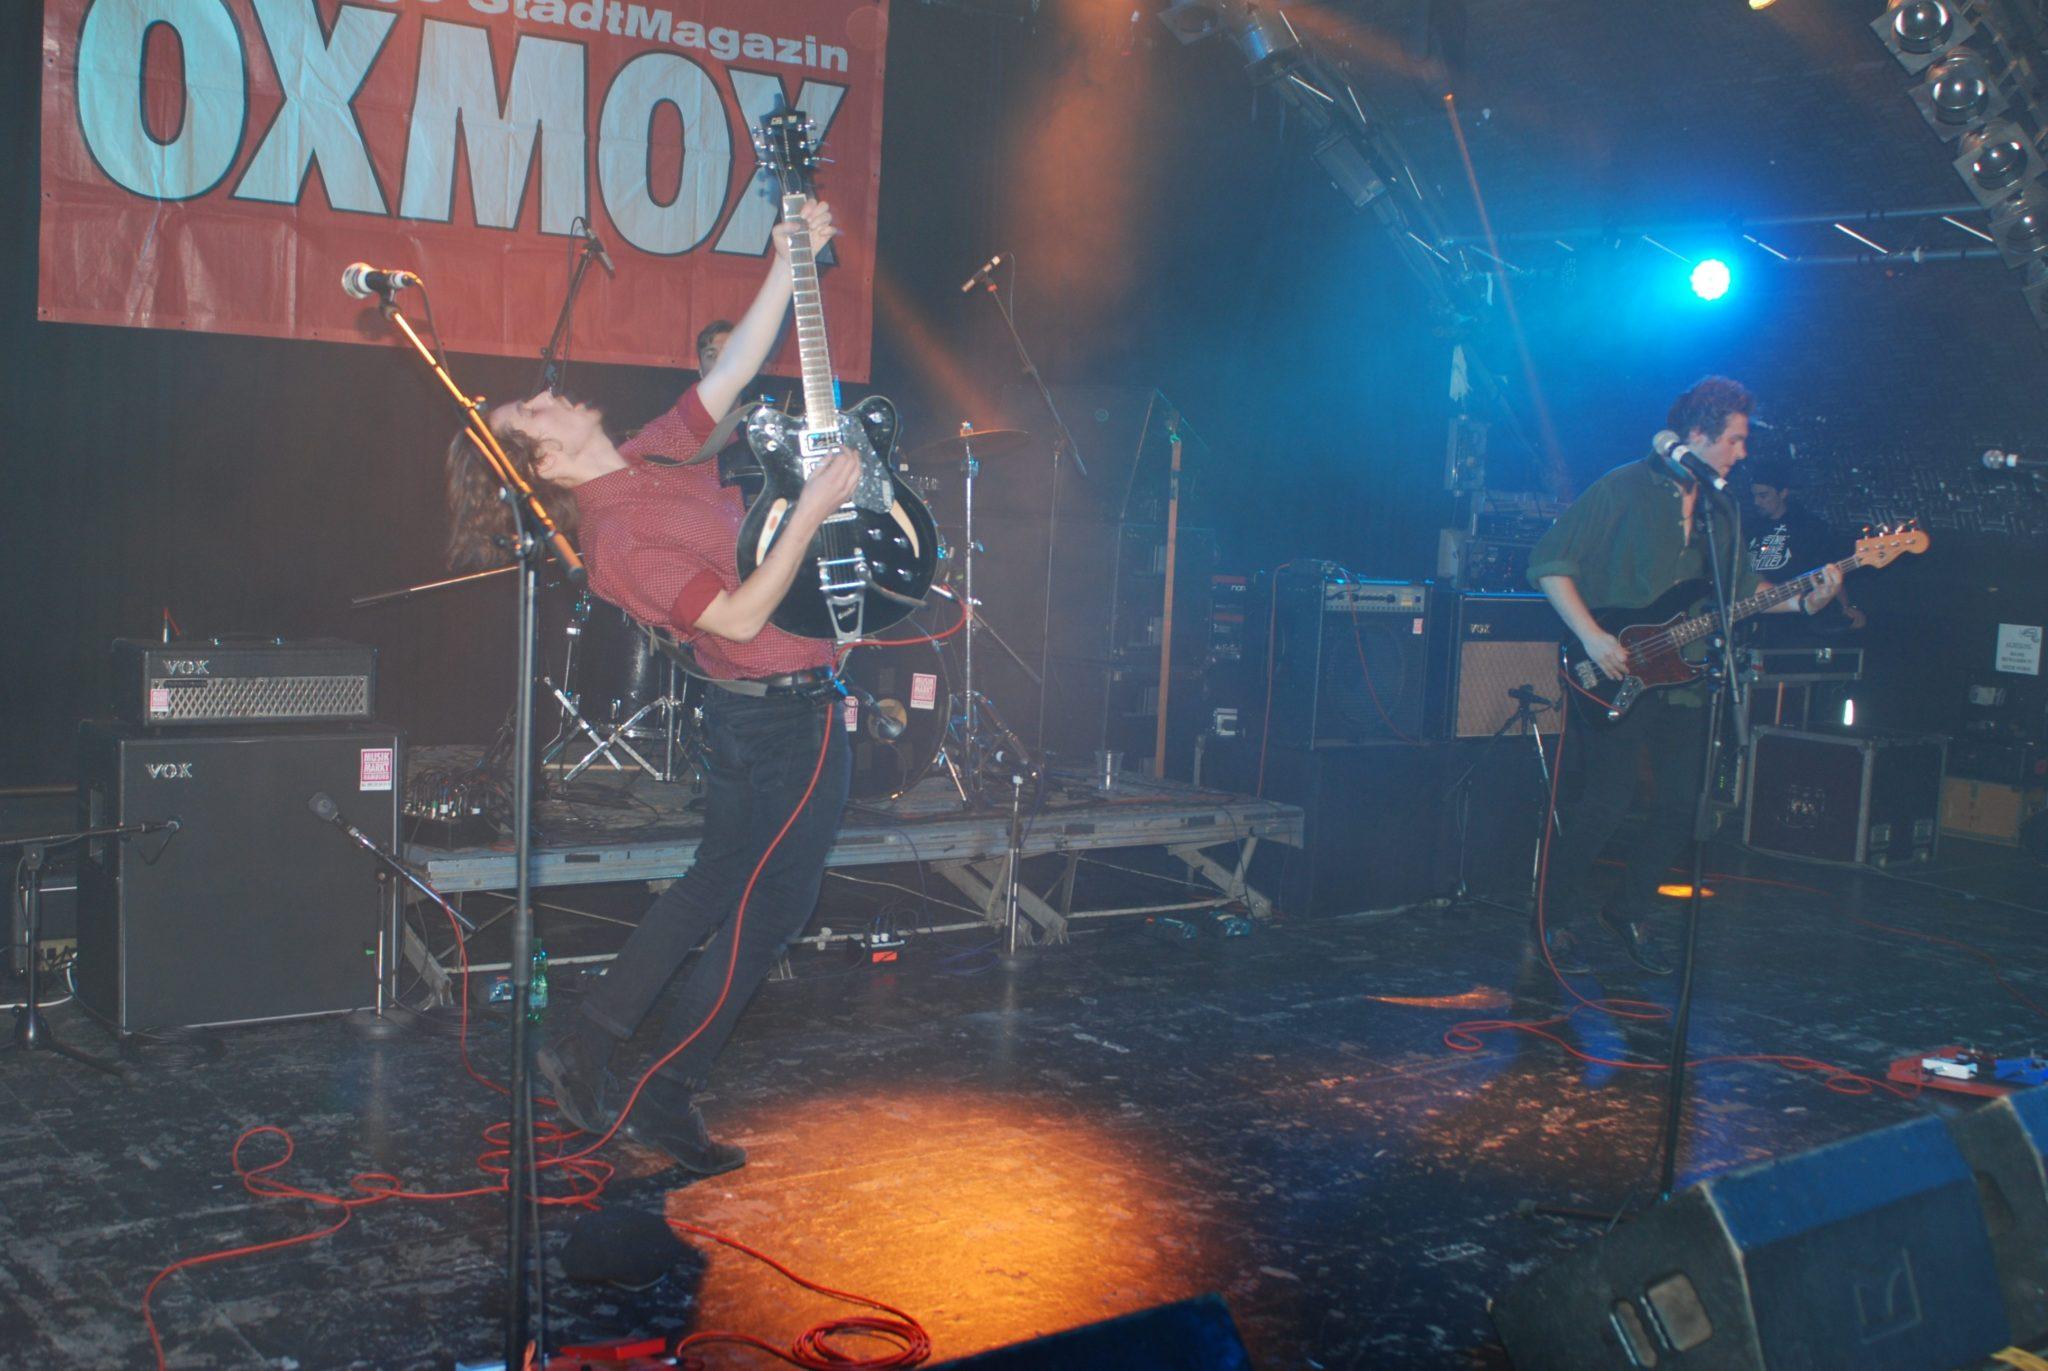 OXMOX Hamburg Bandcontest Finale 2017 prohn und spott 4 - OXMOX PRESENTS: EXKL. FOTOS DES 32. HAMBURG-BANDCONTEST FINALES (12.10.17)